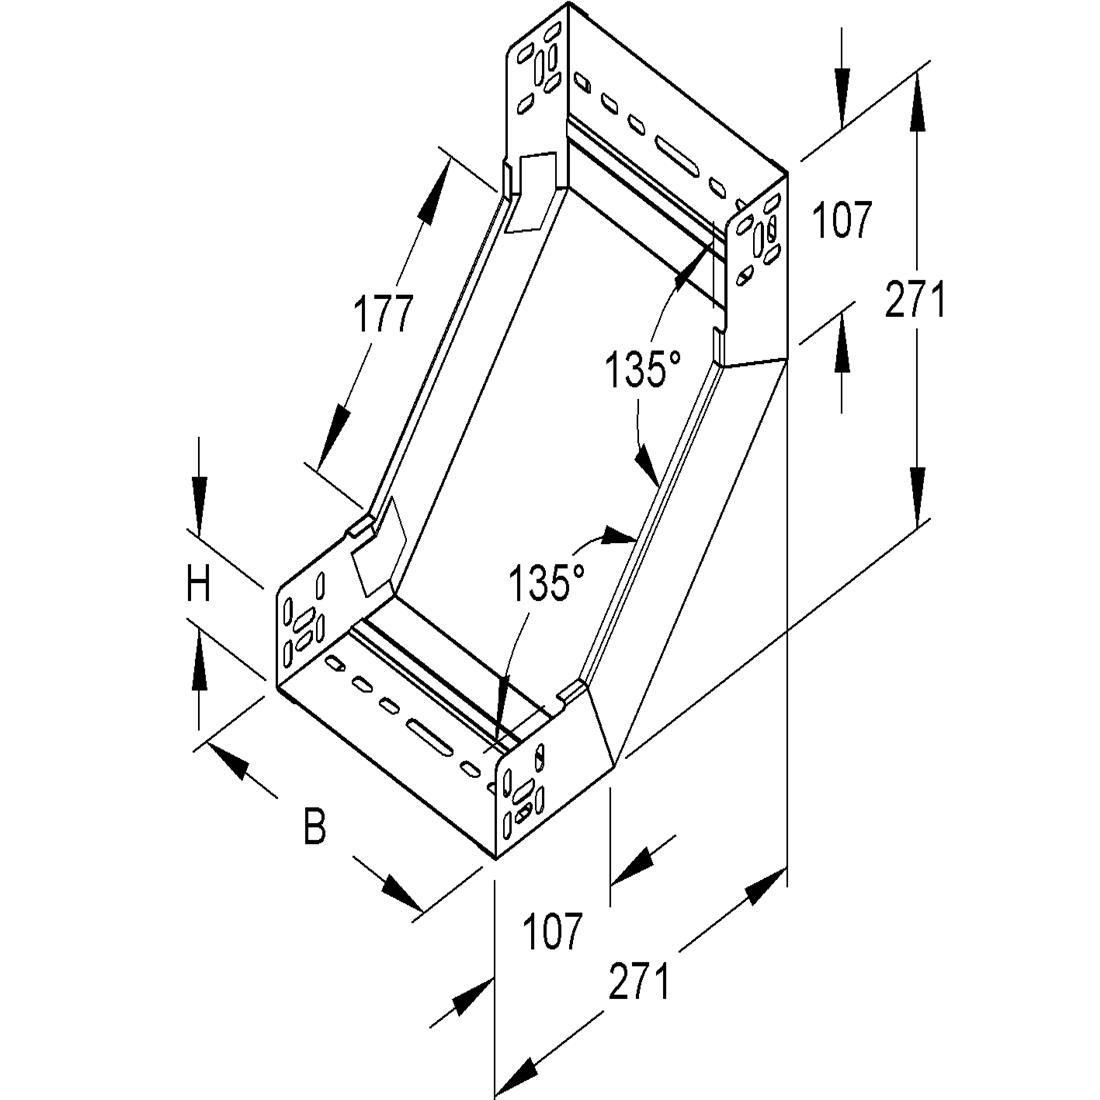 Niedax Kleinhuis kabelgoot stijgstuk zonder deksel voor 600 mm breed RSD60.600